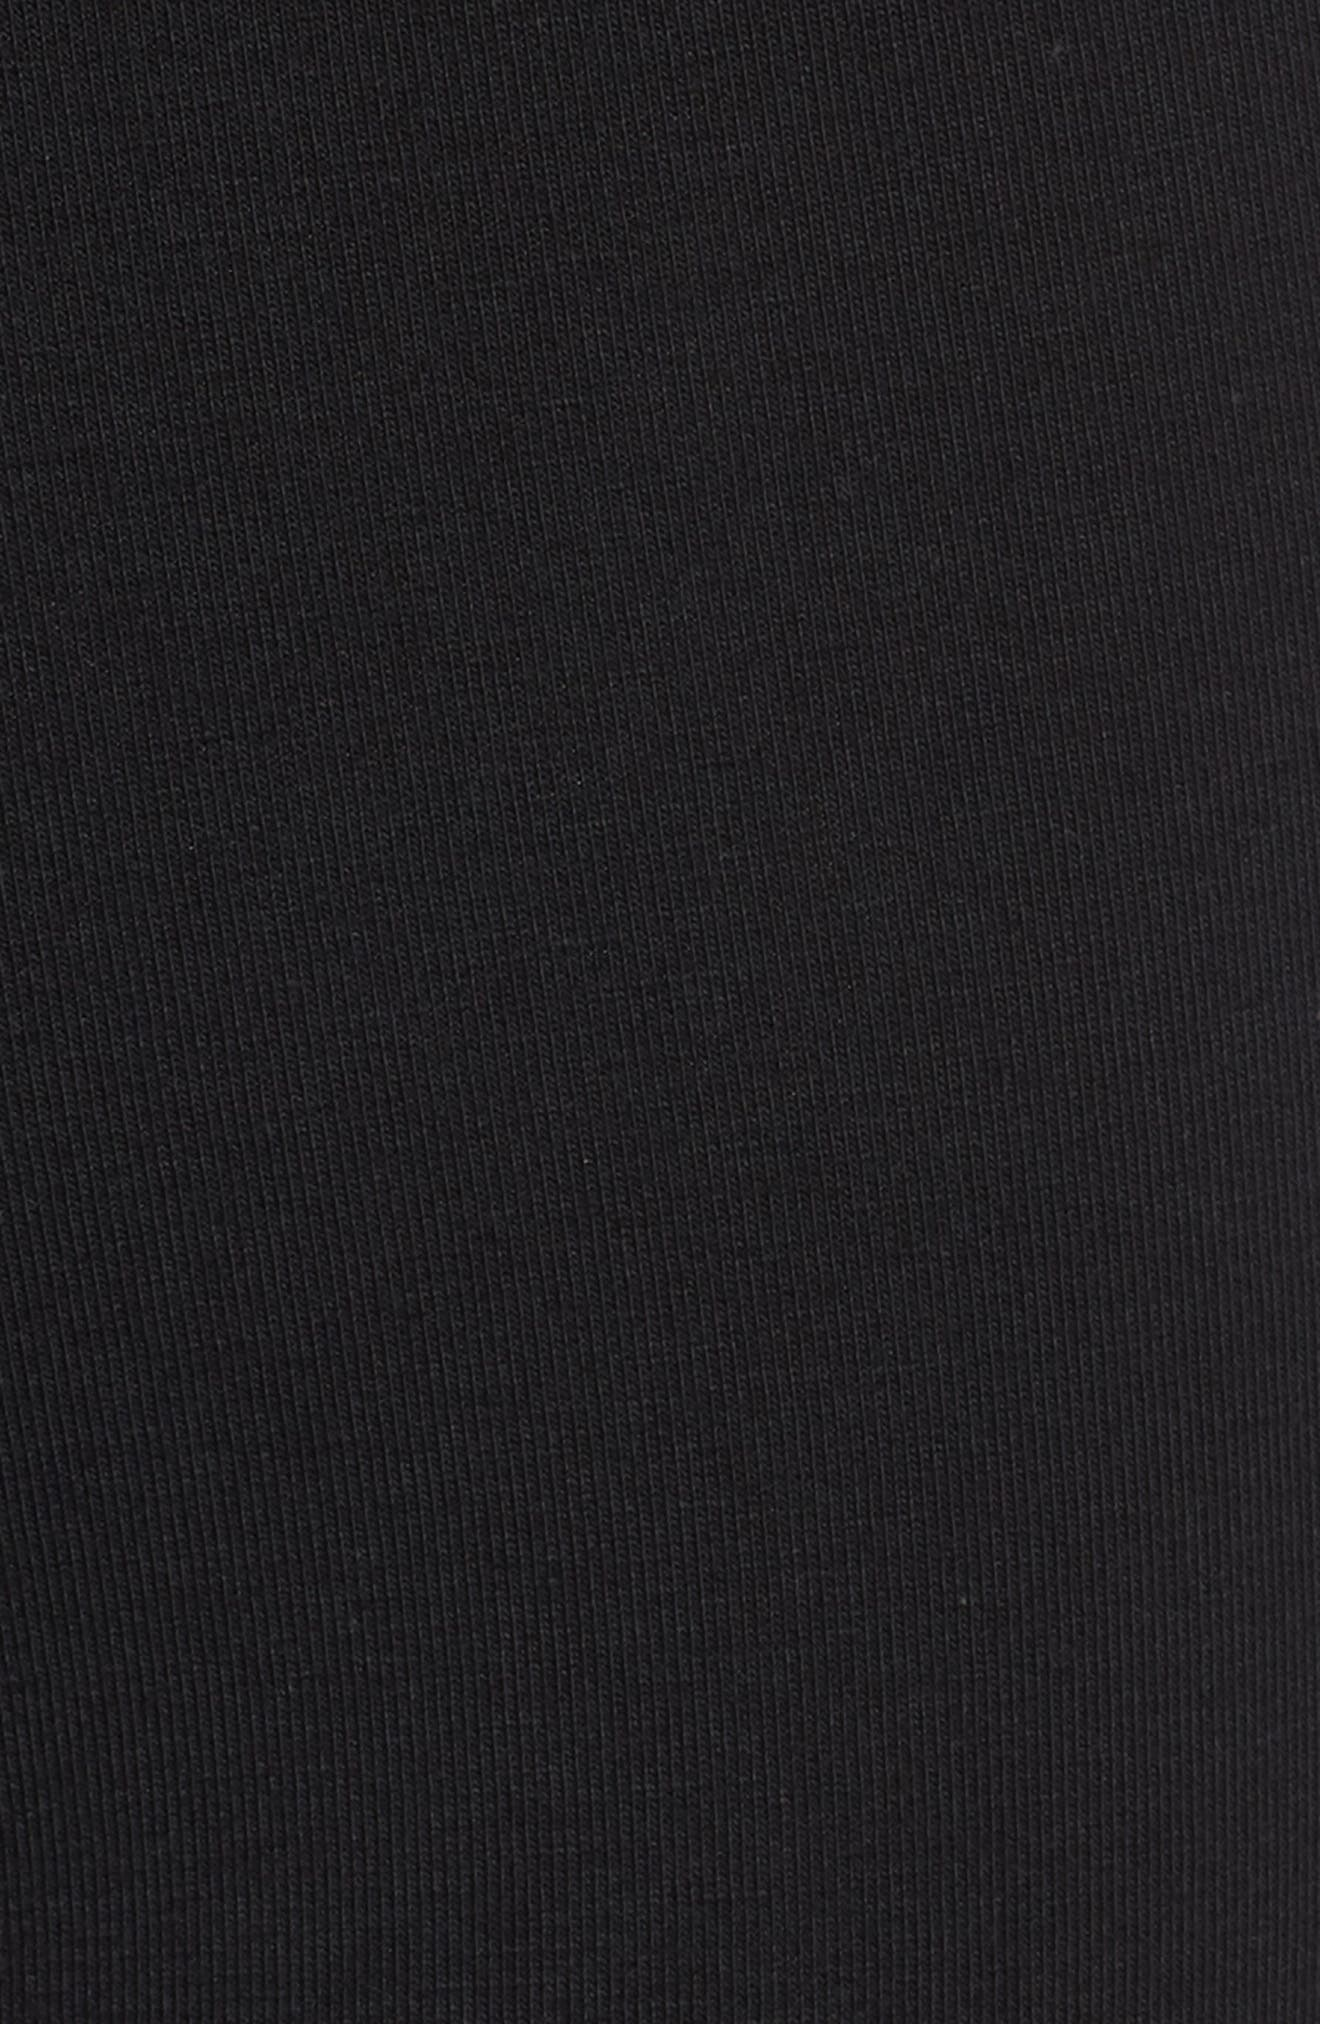 Cotton Trunks,                             Alternate thumbnail 5, color,                             BLACK W/ CAMO WB